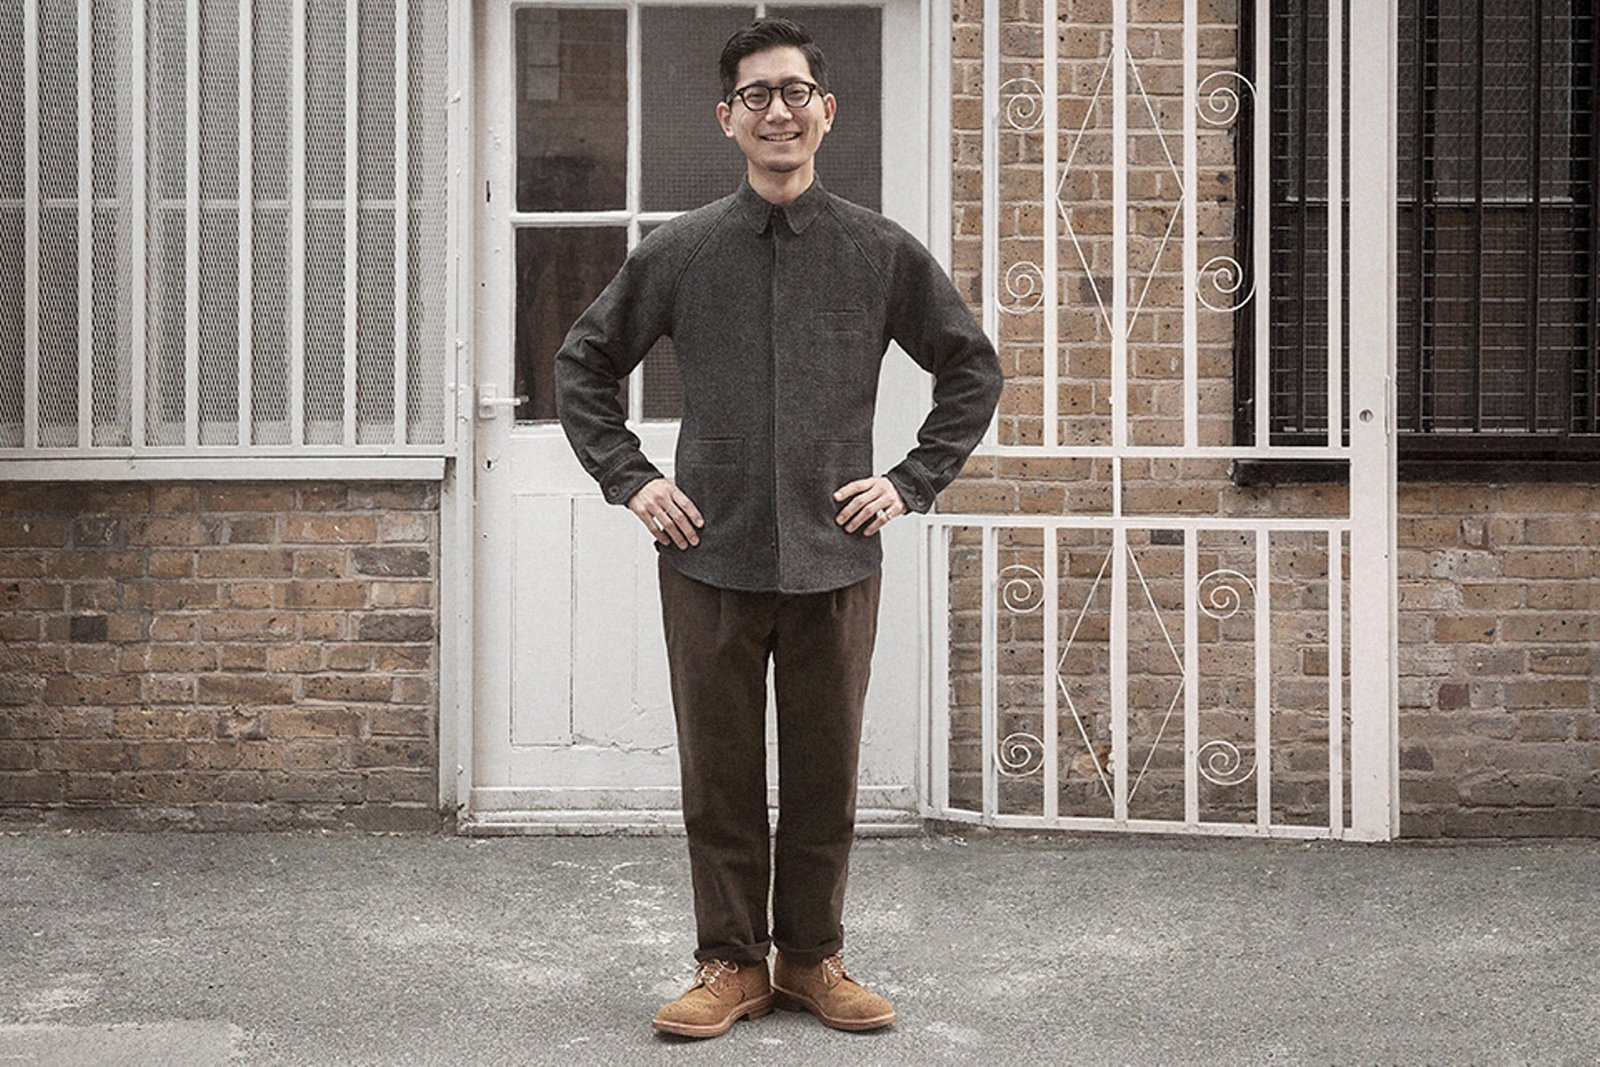 overshirt-charcoal-knit-woollen-twill-worn-1.jpg